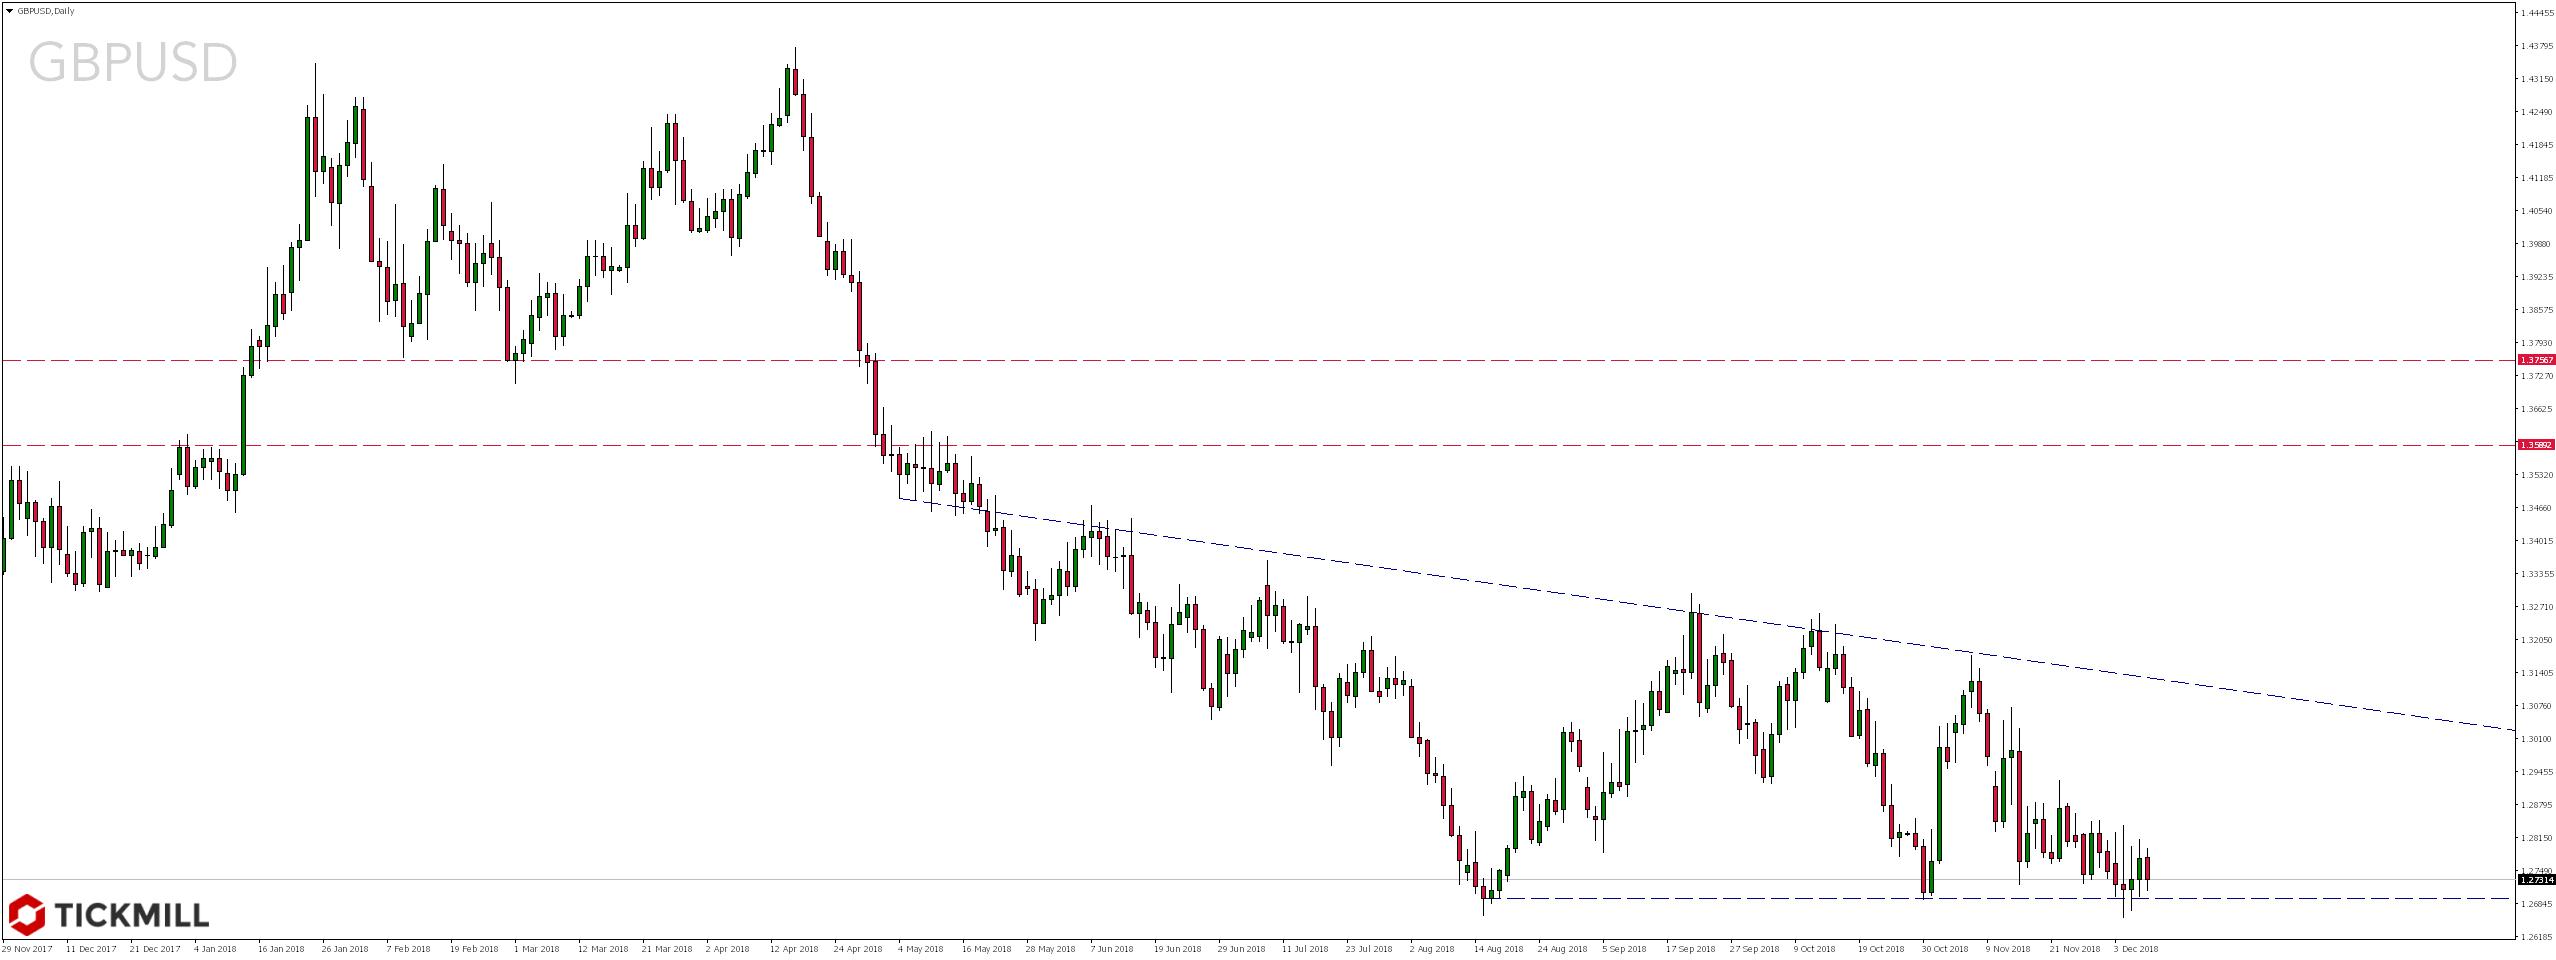 Notowania pary walutowej GBPUSD